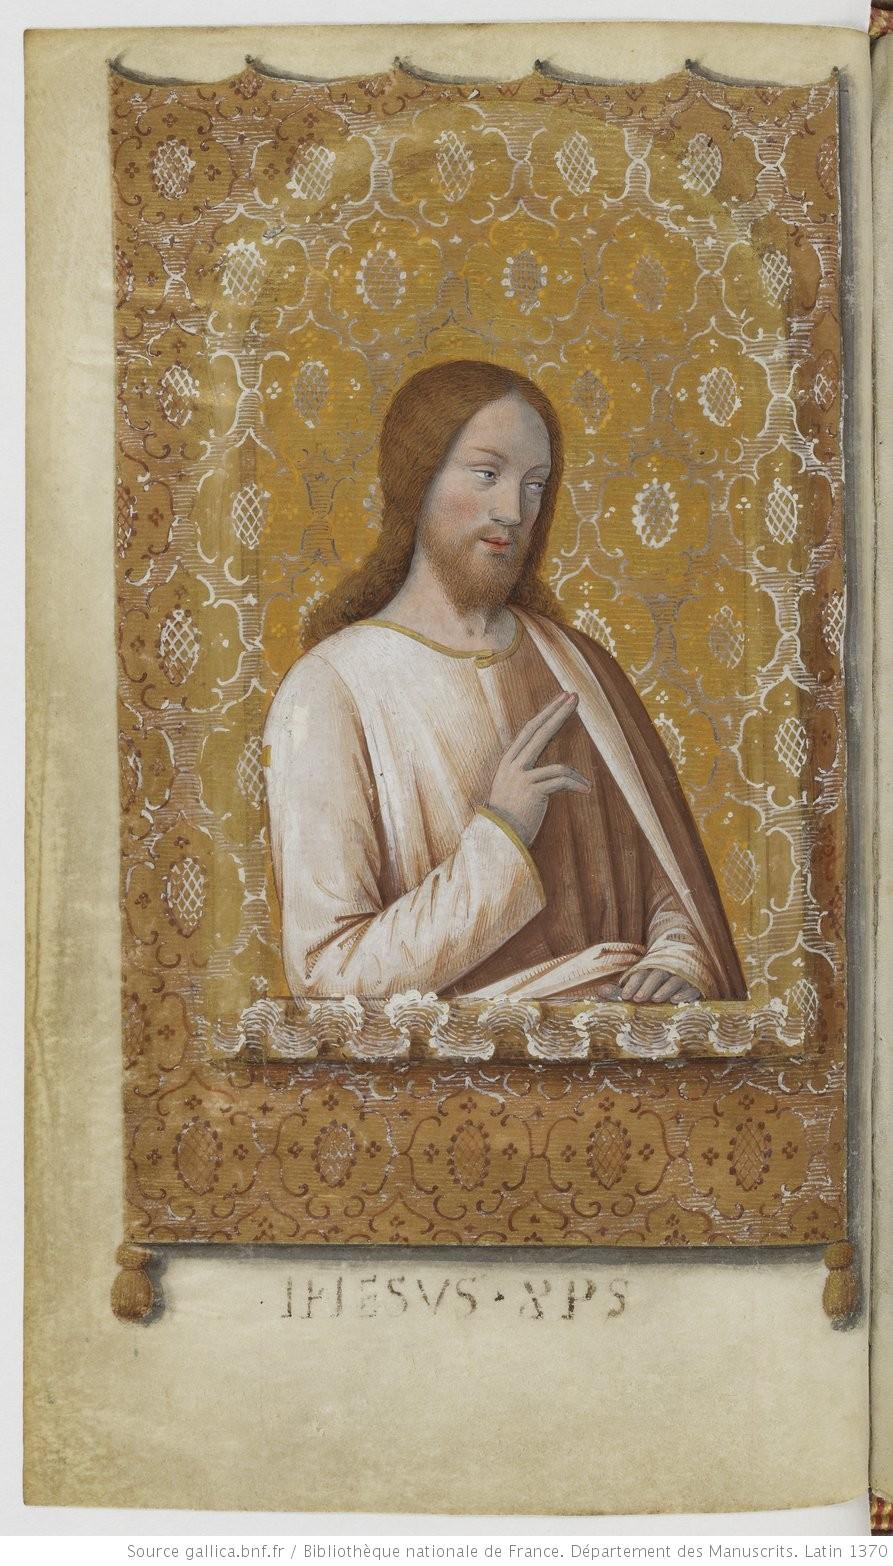 1475-1500 Jean Bourdichon Heures de Charles VIII, BNF 1370 fol 35v